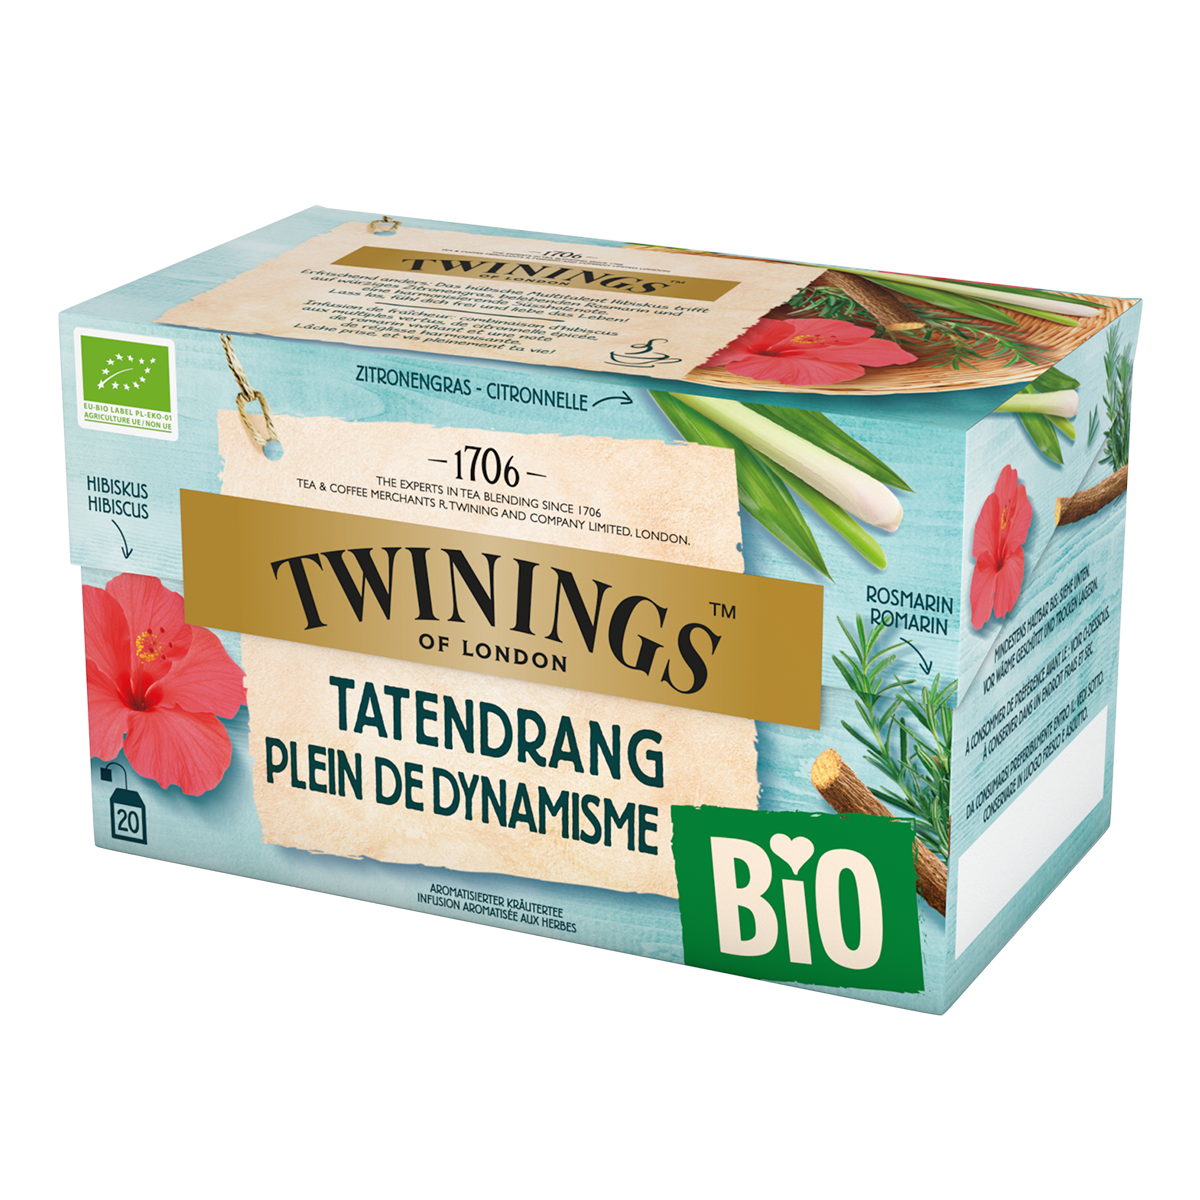 Twinings Bio Plein de Dynamisme 34g